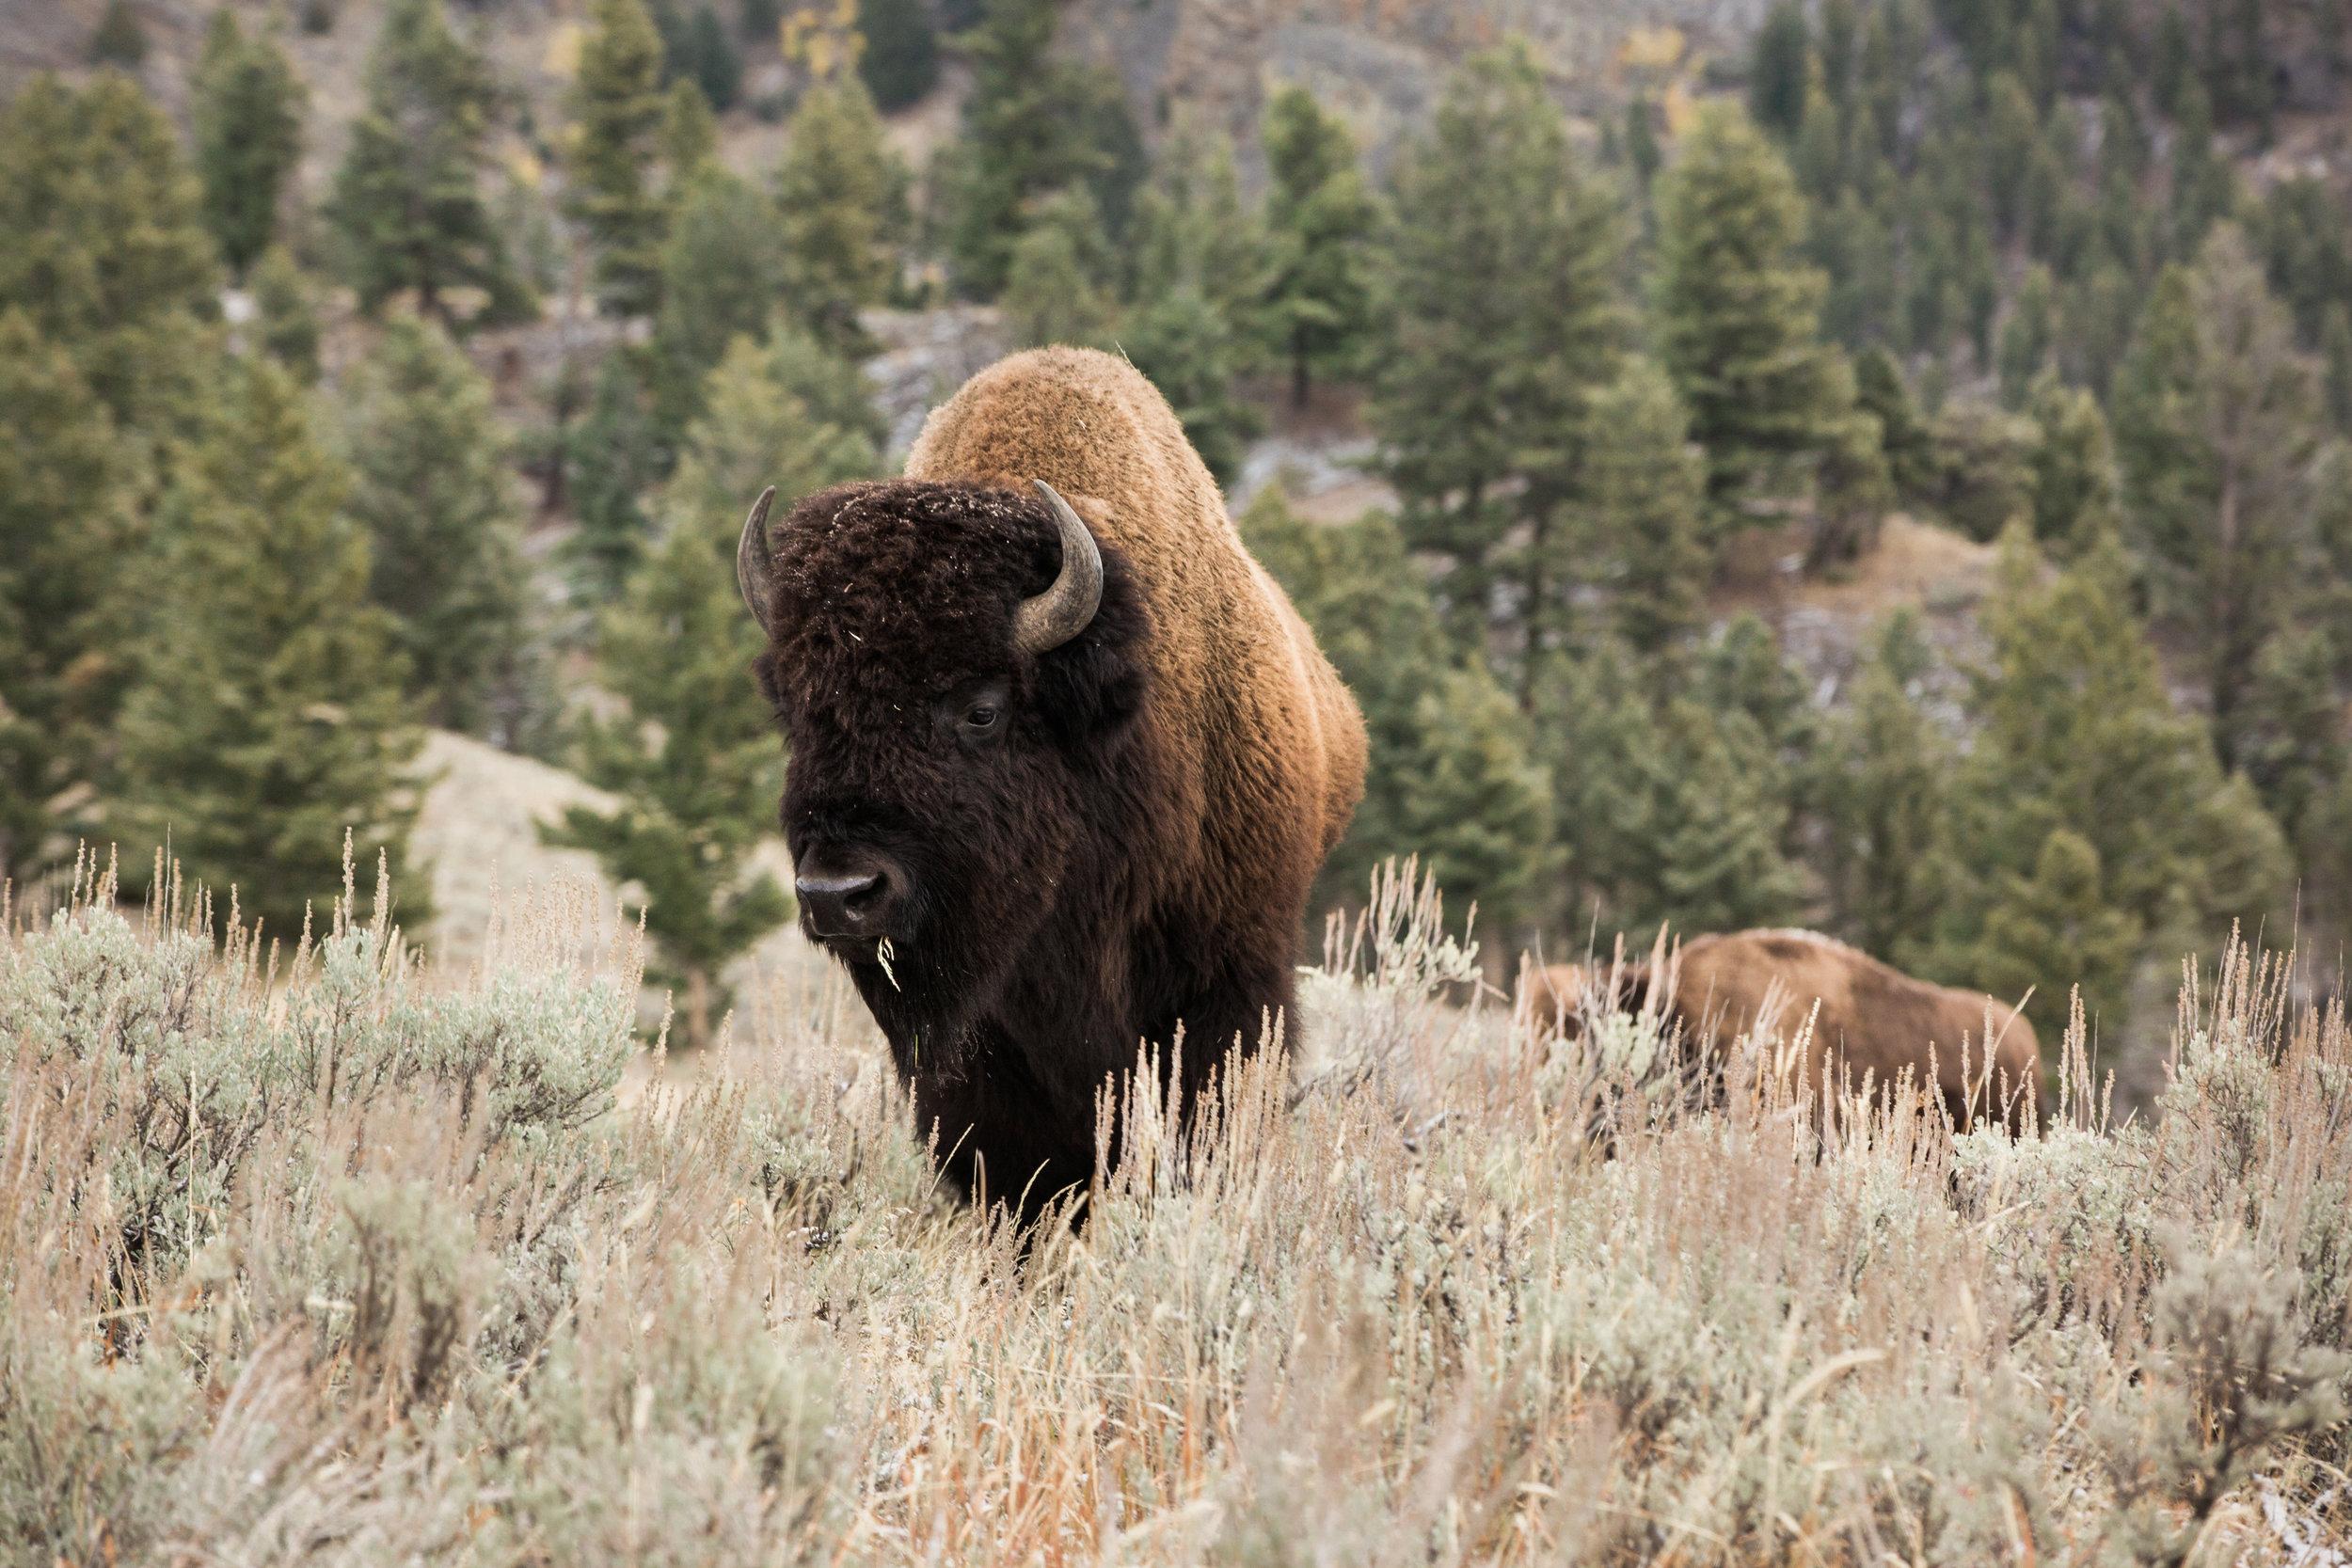 CindyGiovagnoli_outdoor_adventure_photography_Grand_Teton_Yellowstone_Glacier_National_Park_Montana_Wyoming_South_Dakota_Mount_Rushmore_Badlands-023.jpg